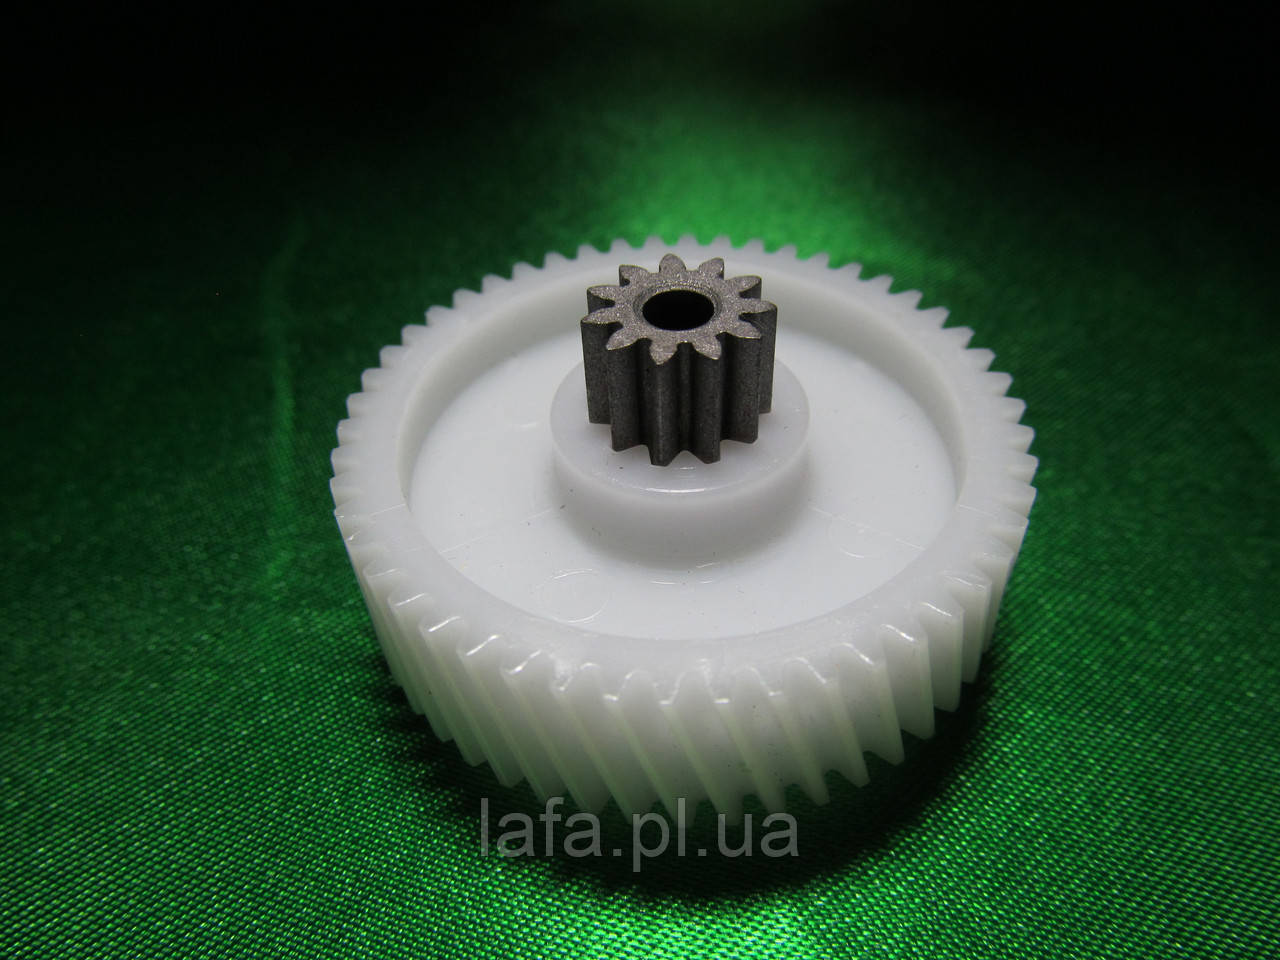 Шестерня  Бриз, Аксион D=42/11 мм, пластик+метал (для мясорубок и кухонных комбайнов Аксион, Бриз) - Интернет магазин Лафа в Полтаве